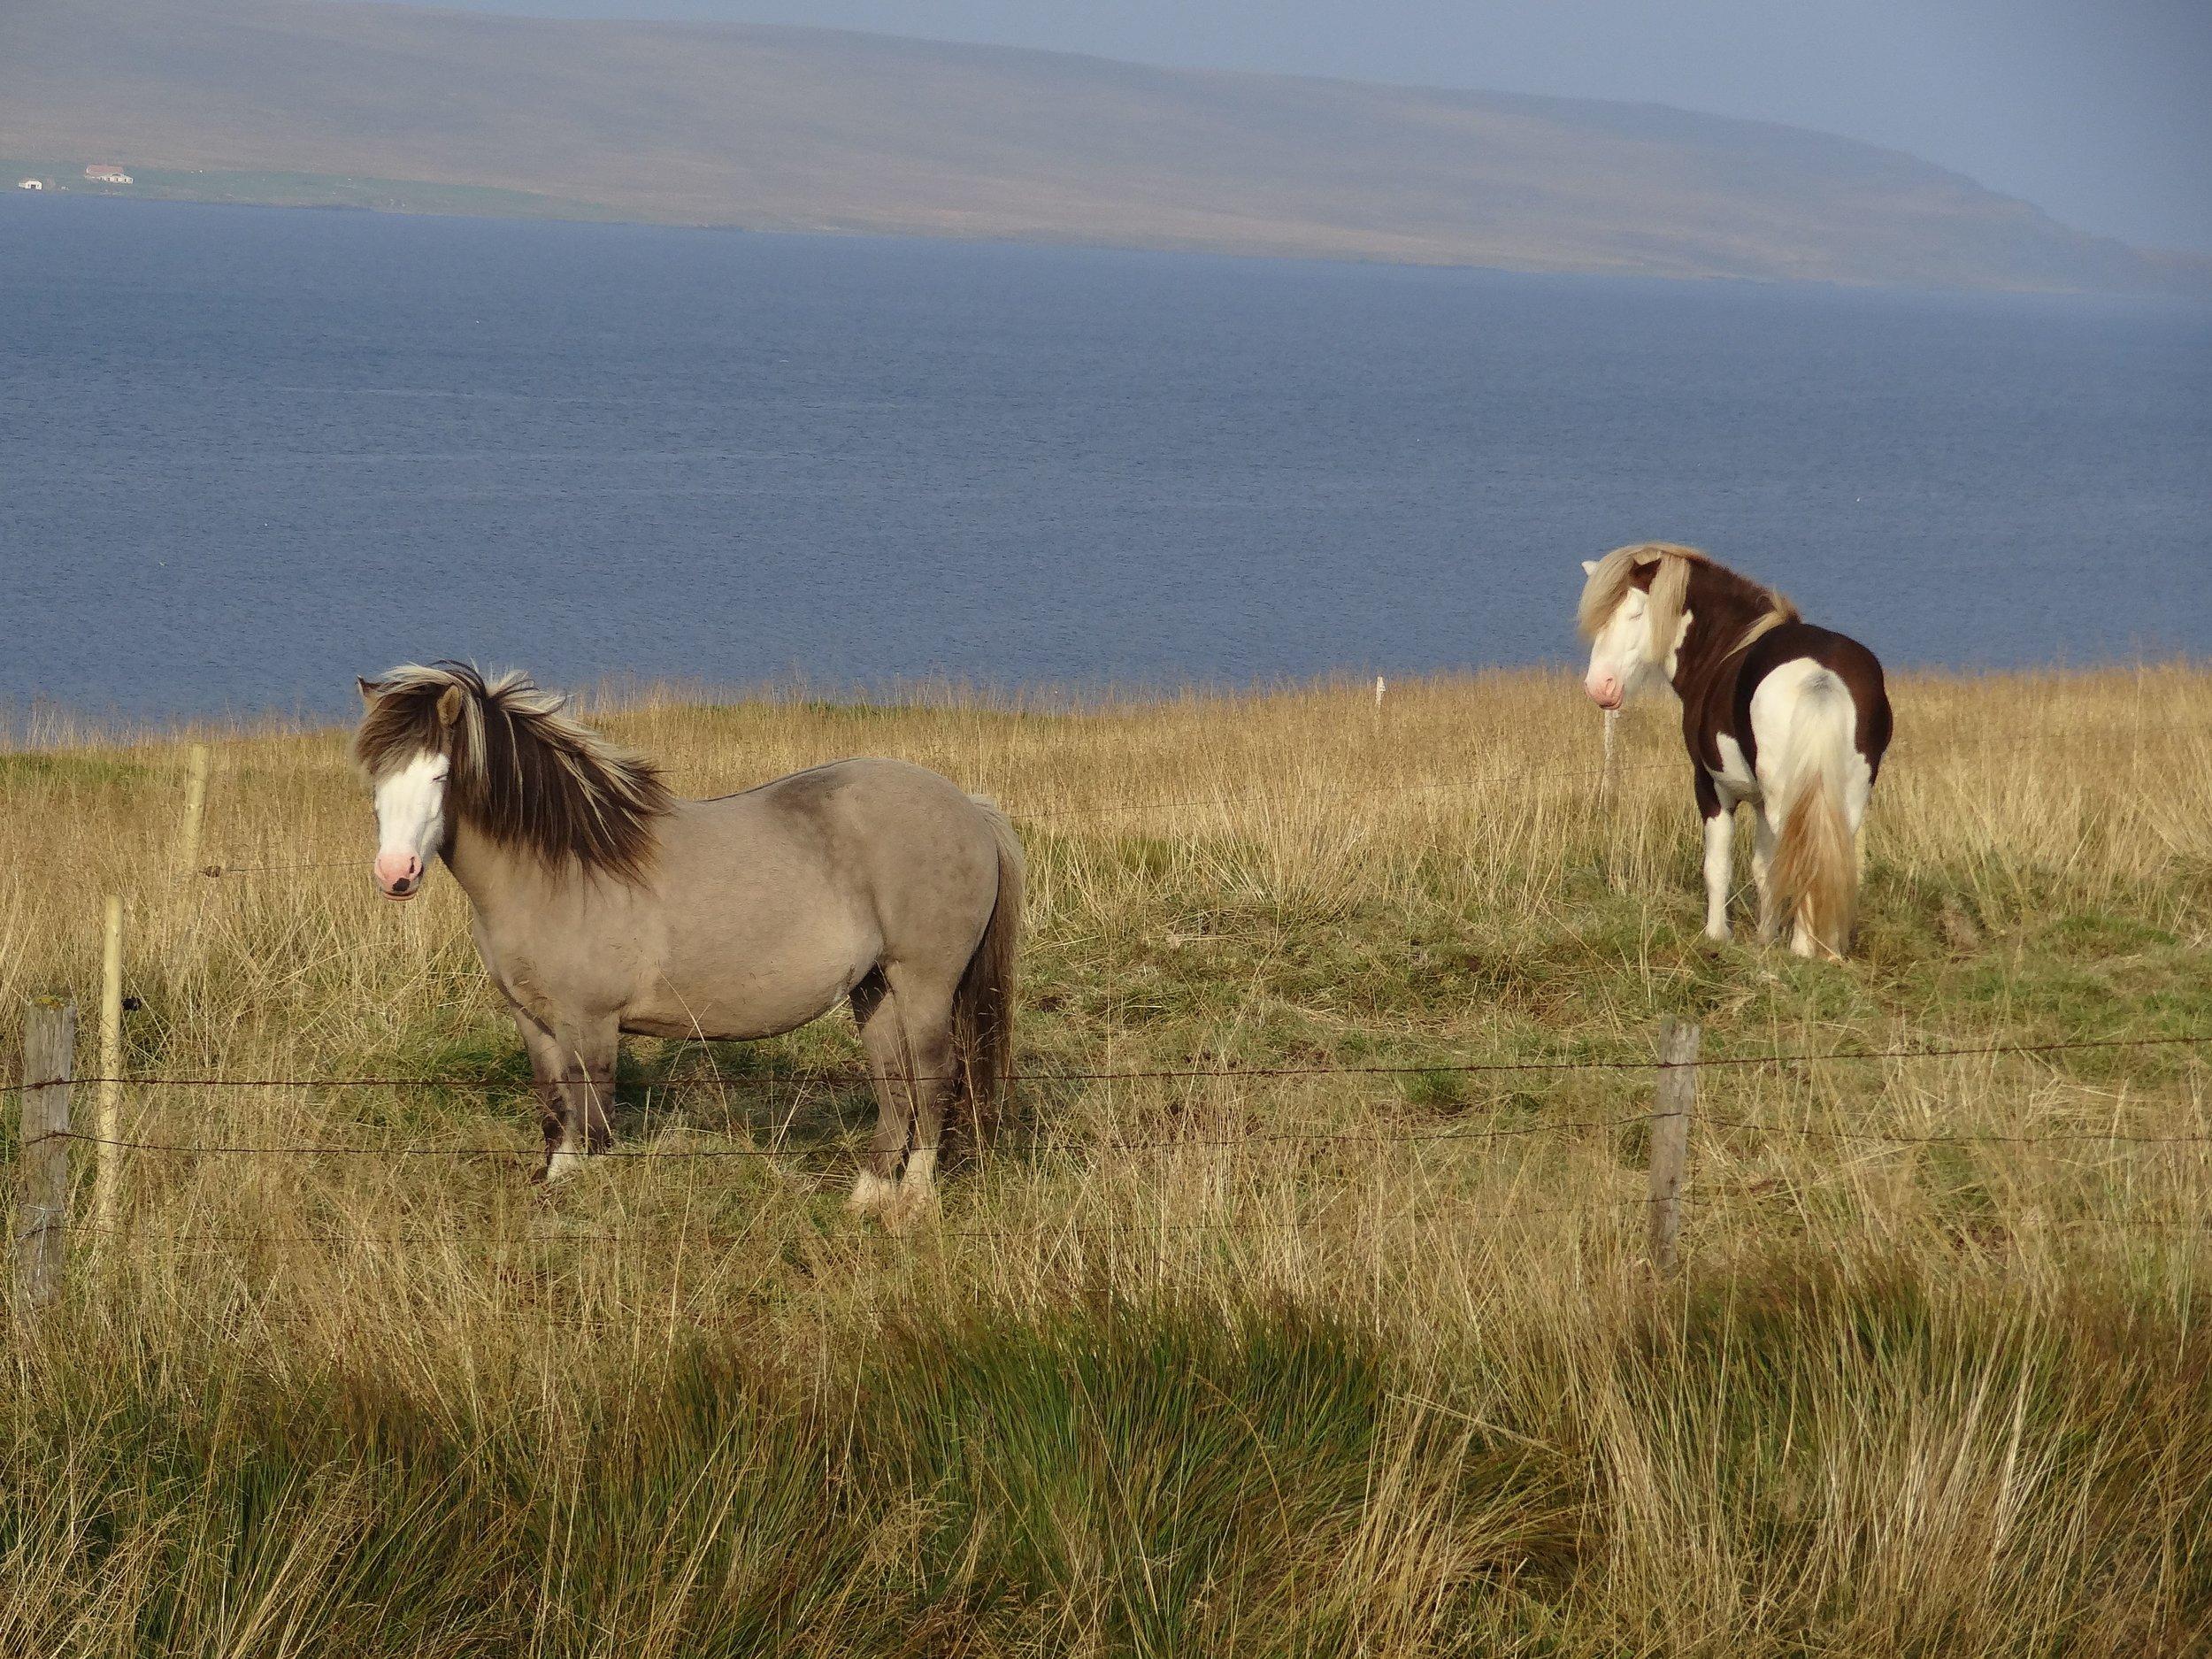 Icealandic horses.